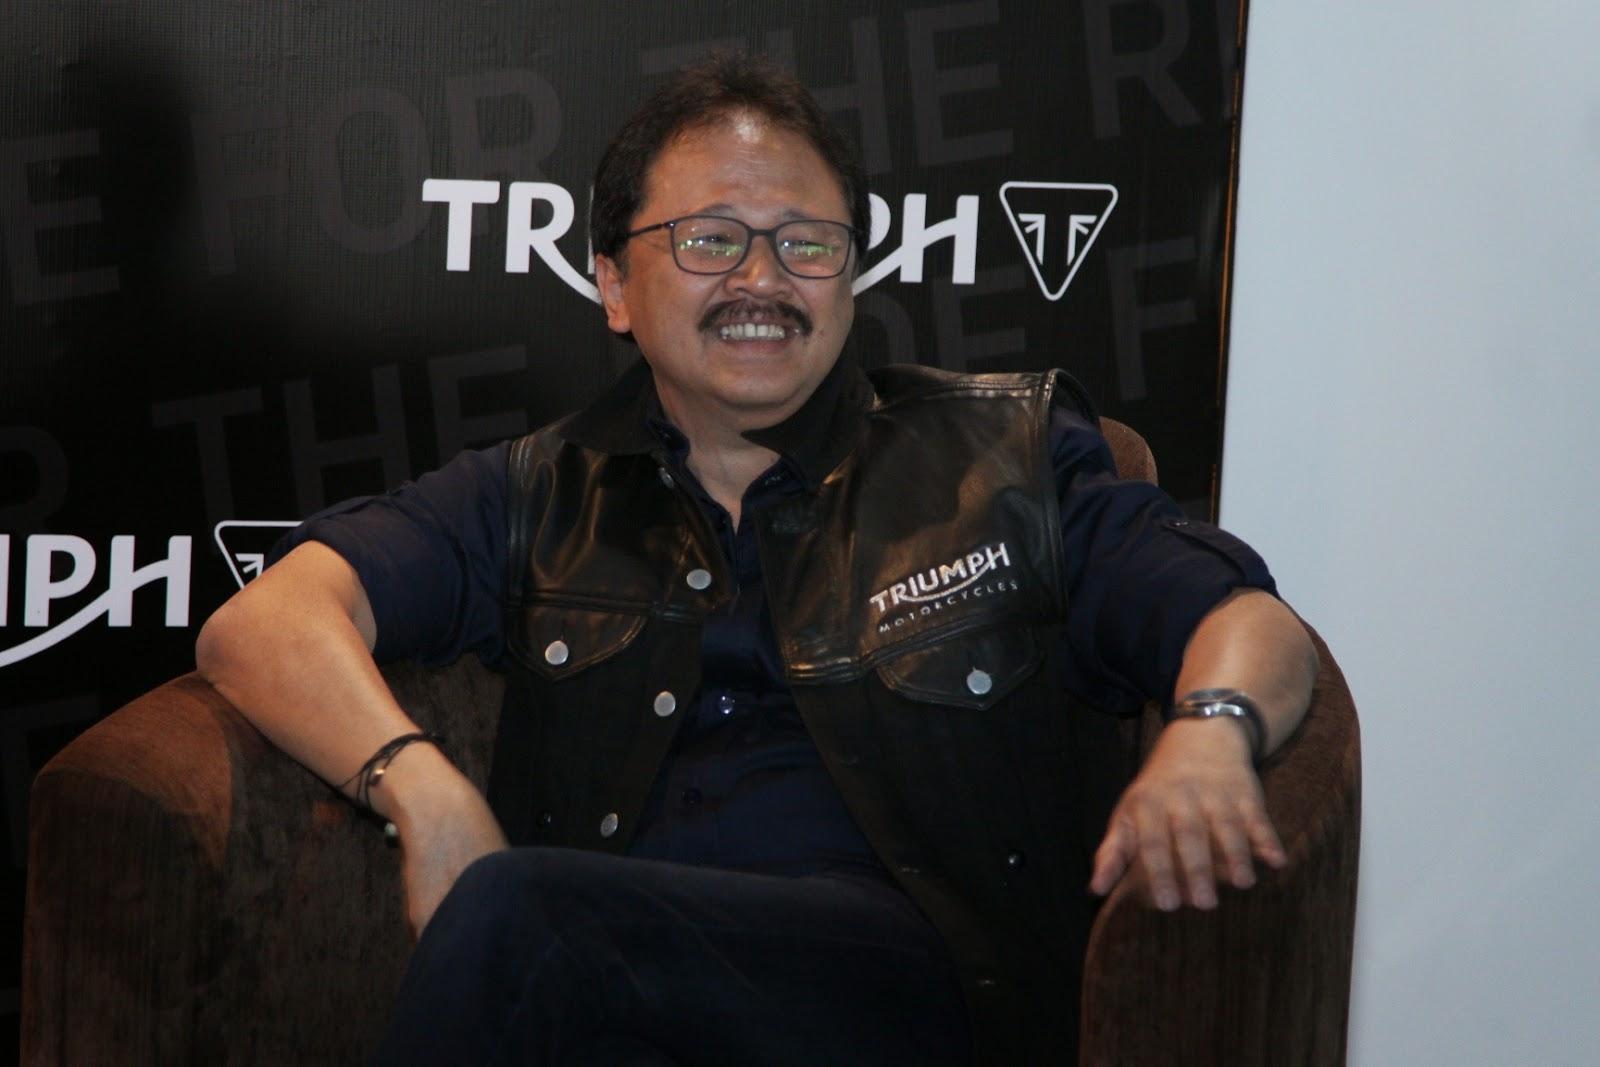 Tora Sudiro dan Jajaran Managemen Triumph Indonesia Triumph Siap Bersaing Di pasar Indonesia